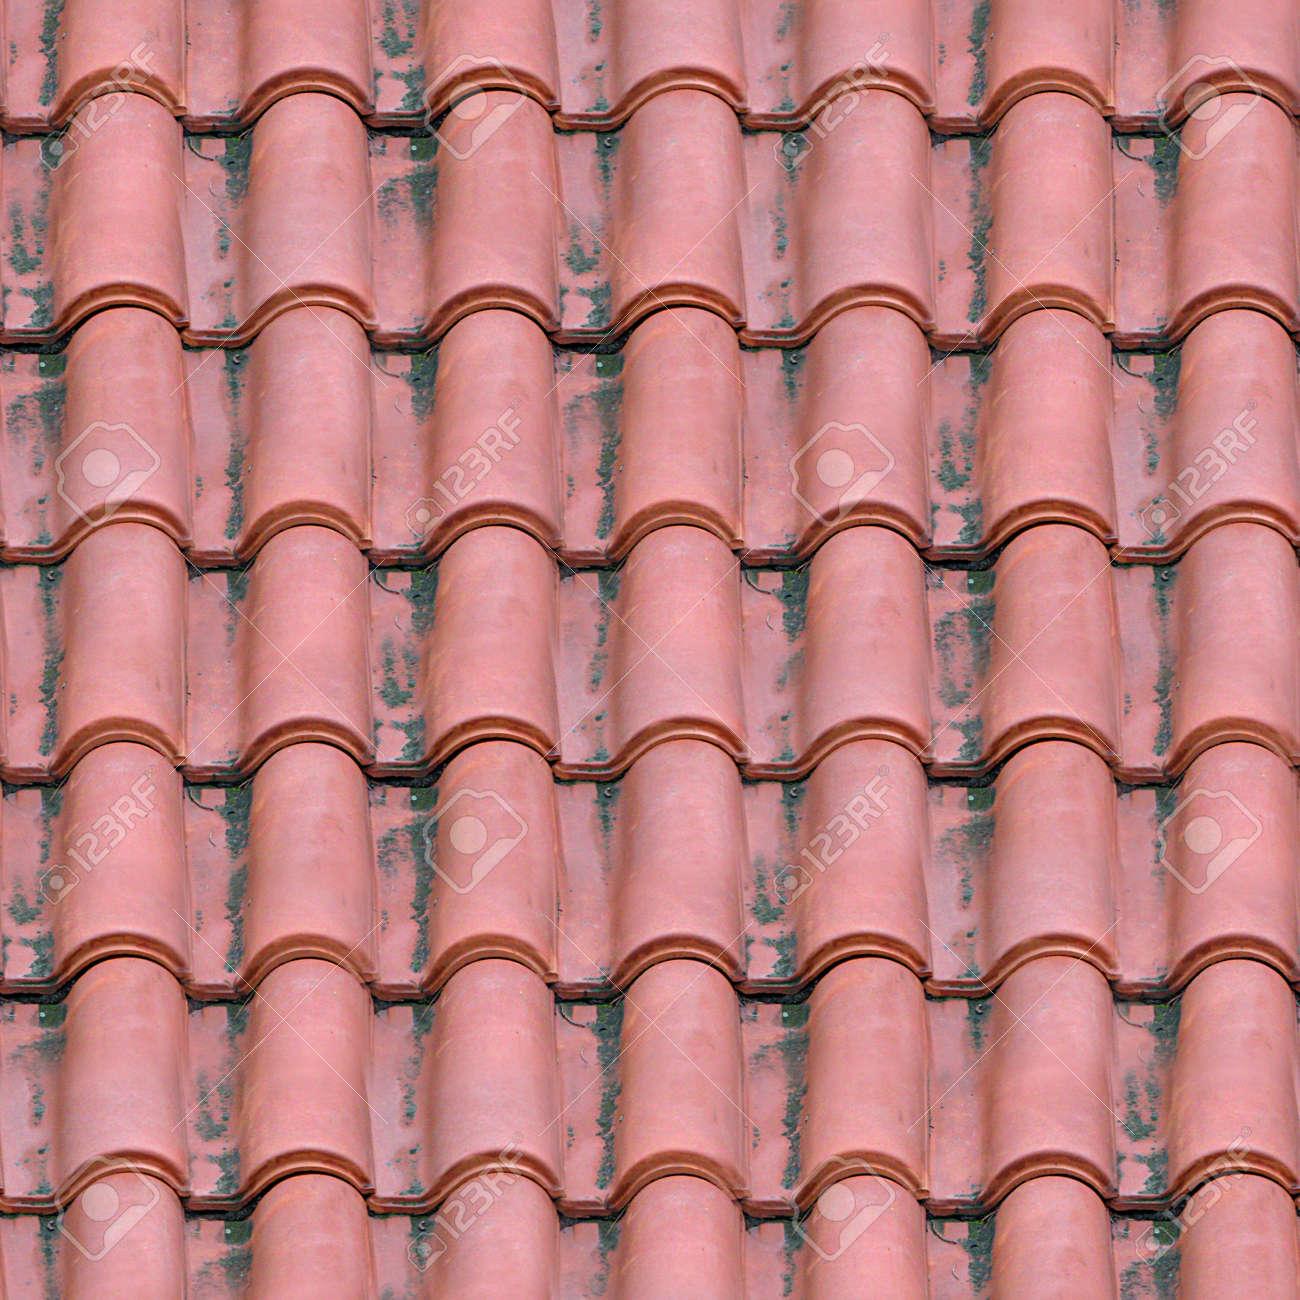 Roofing ceramic textures textures texture seamless concrete spanish tile roofing seamless texture tile stock photo 13102646 sc 1 st 123rf stock photos dailygadgetfo Choice Image